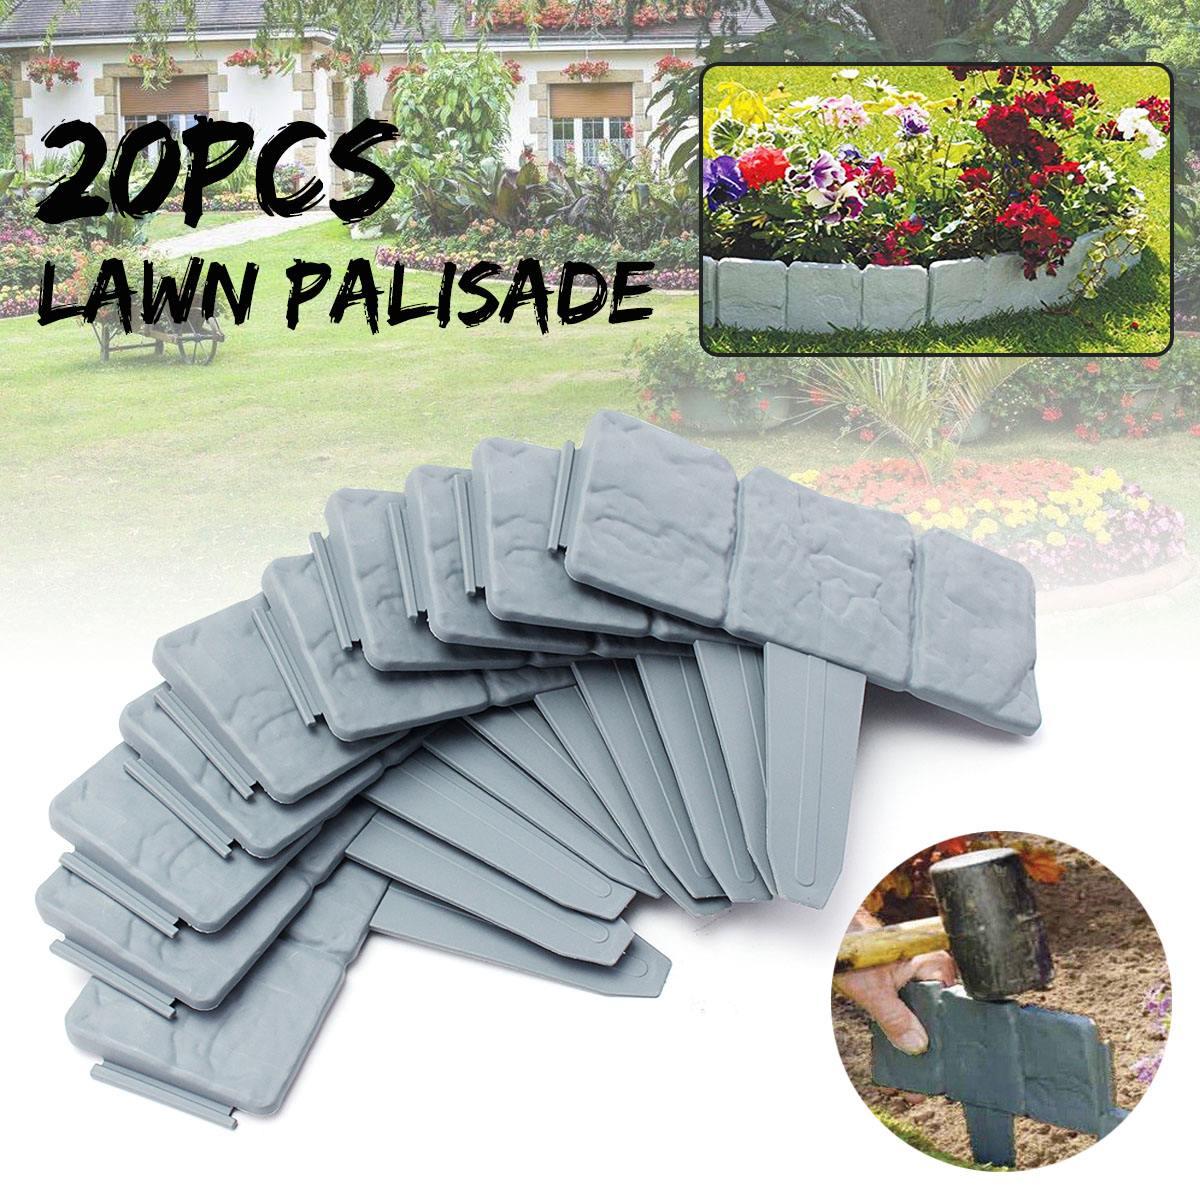 20Pcs Grey Garden Fence Edging Cobbled Stone Effect Plastic Lawn Edging Plant Border Decorations Flower Bed Border